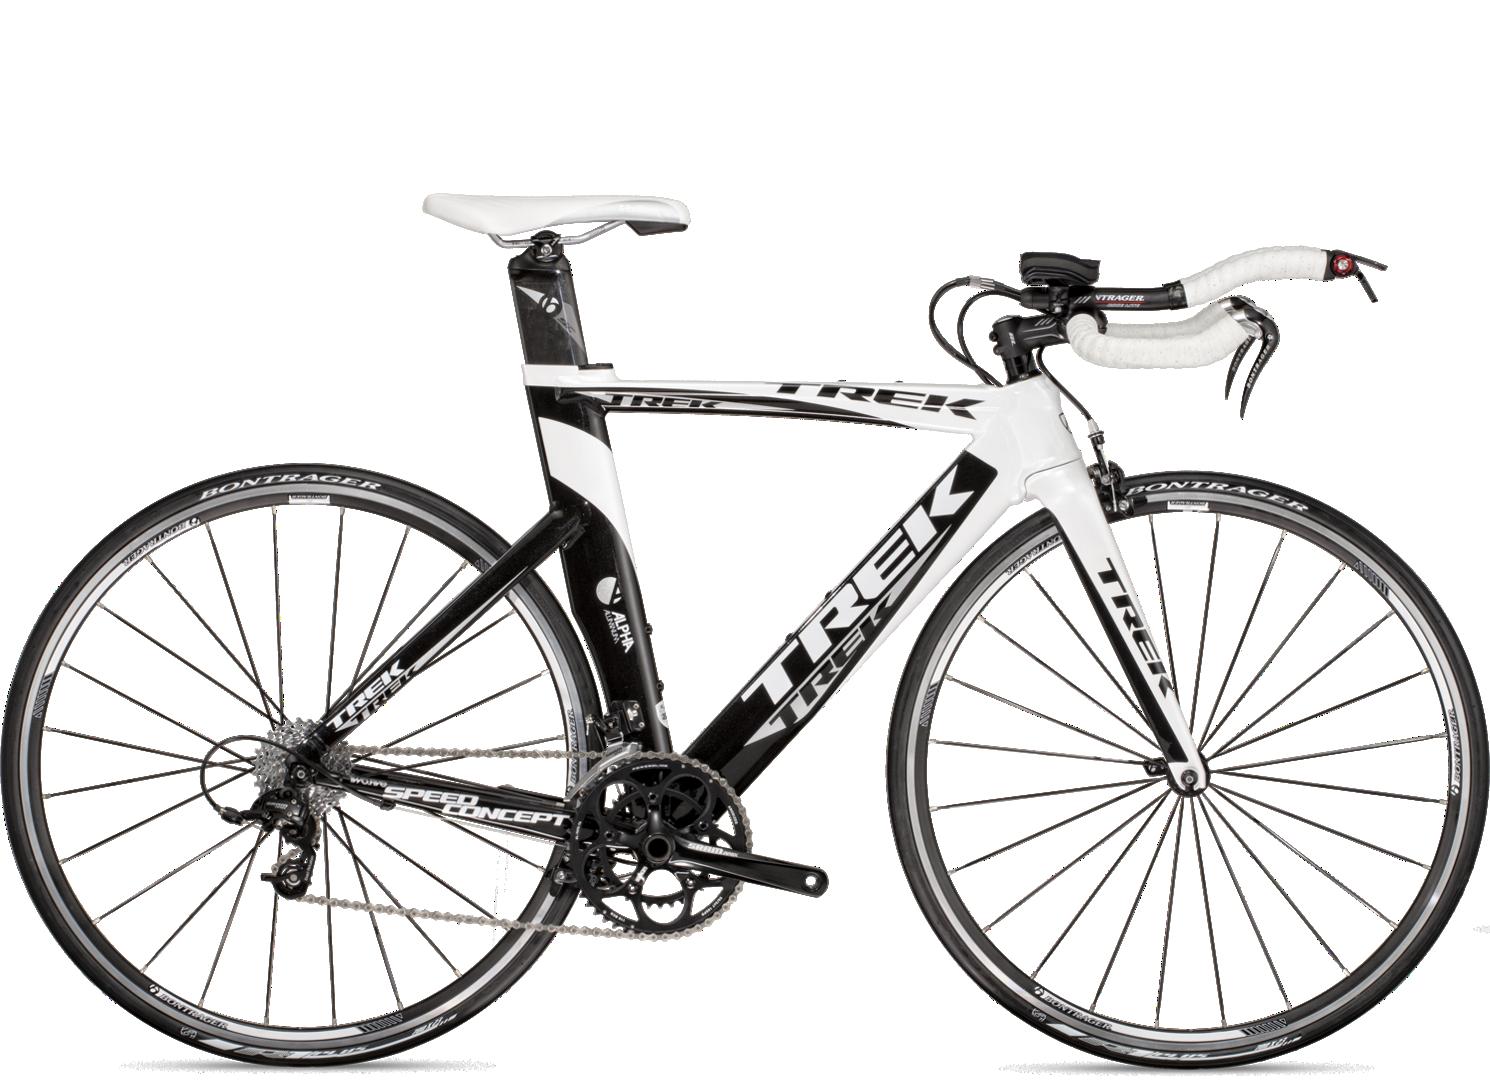 2012 Speed Concept 2.5 - Bike Archive - Trek Bicycle